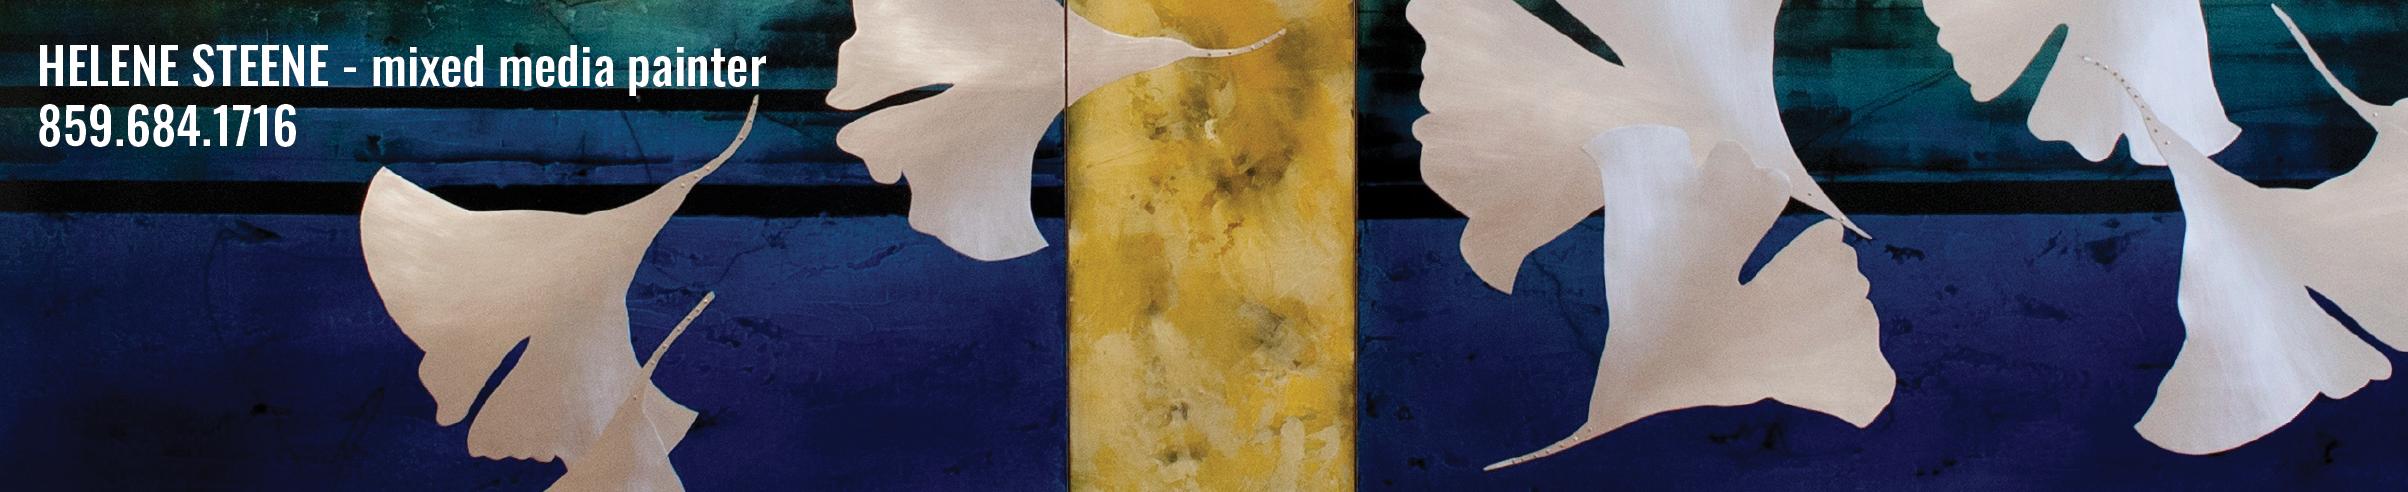 Cosmic Contemplations: The Elemental Paintings of Helene Steene - CODAworx